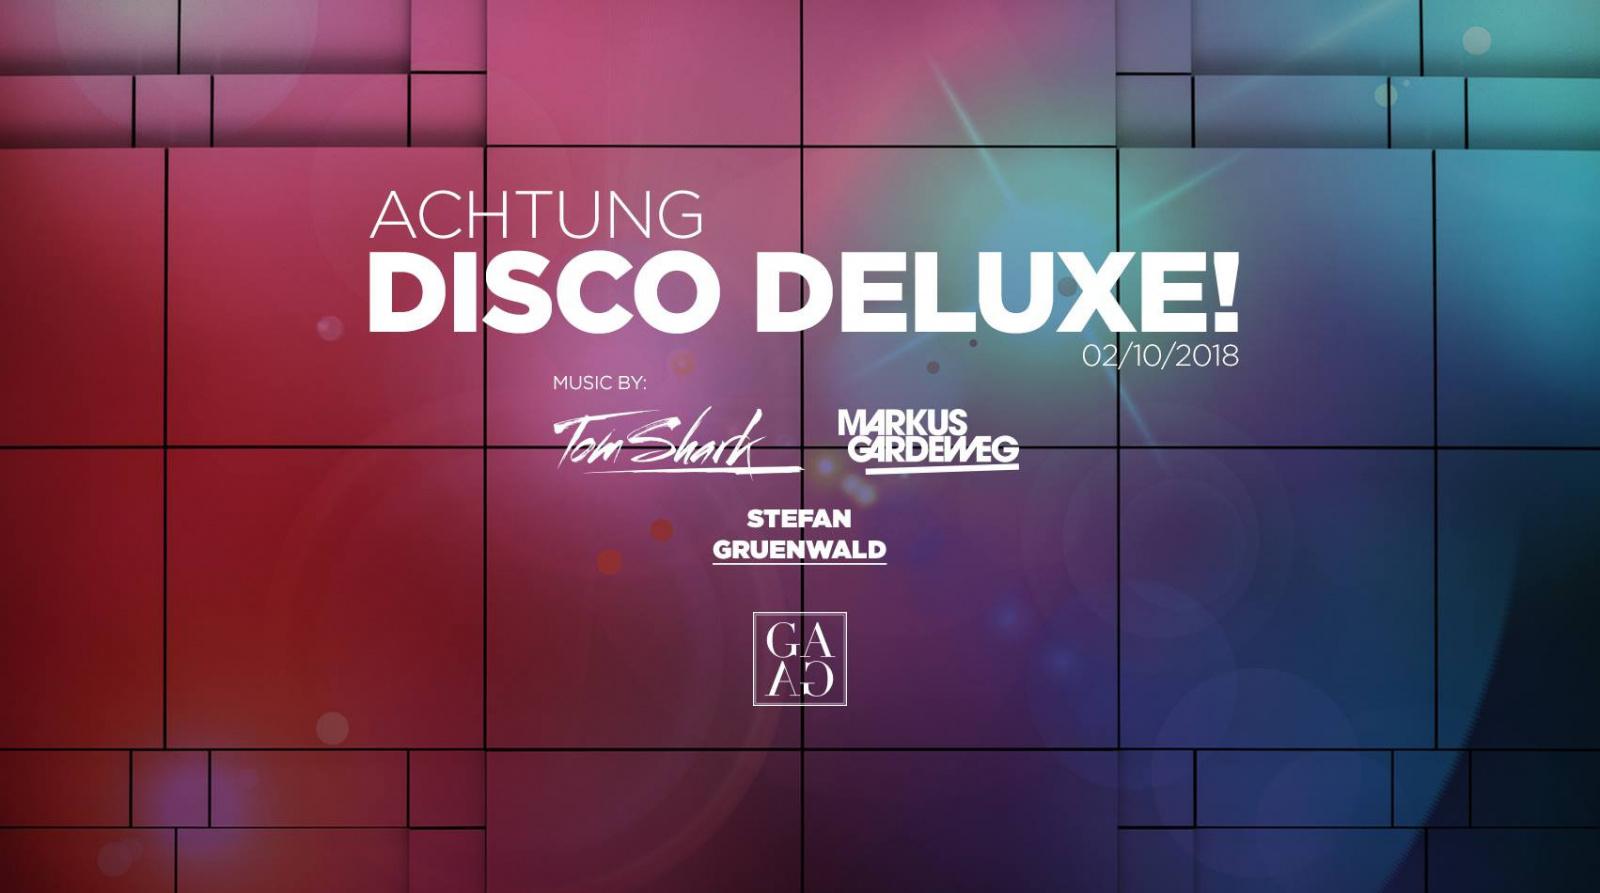 Achtung Disco! Deluxe